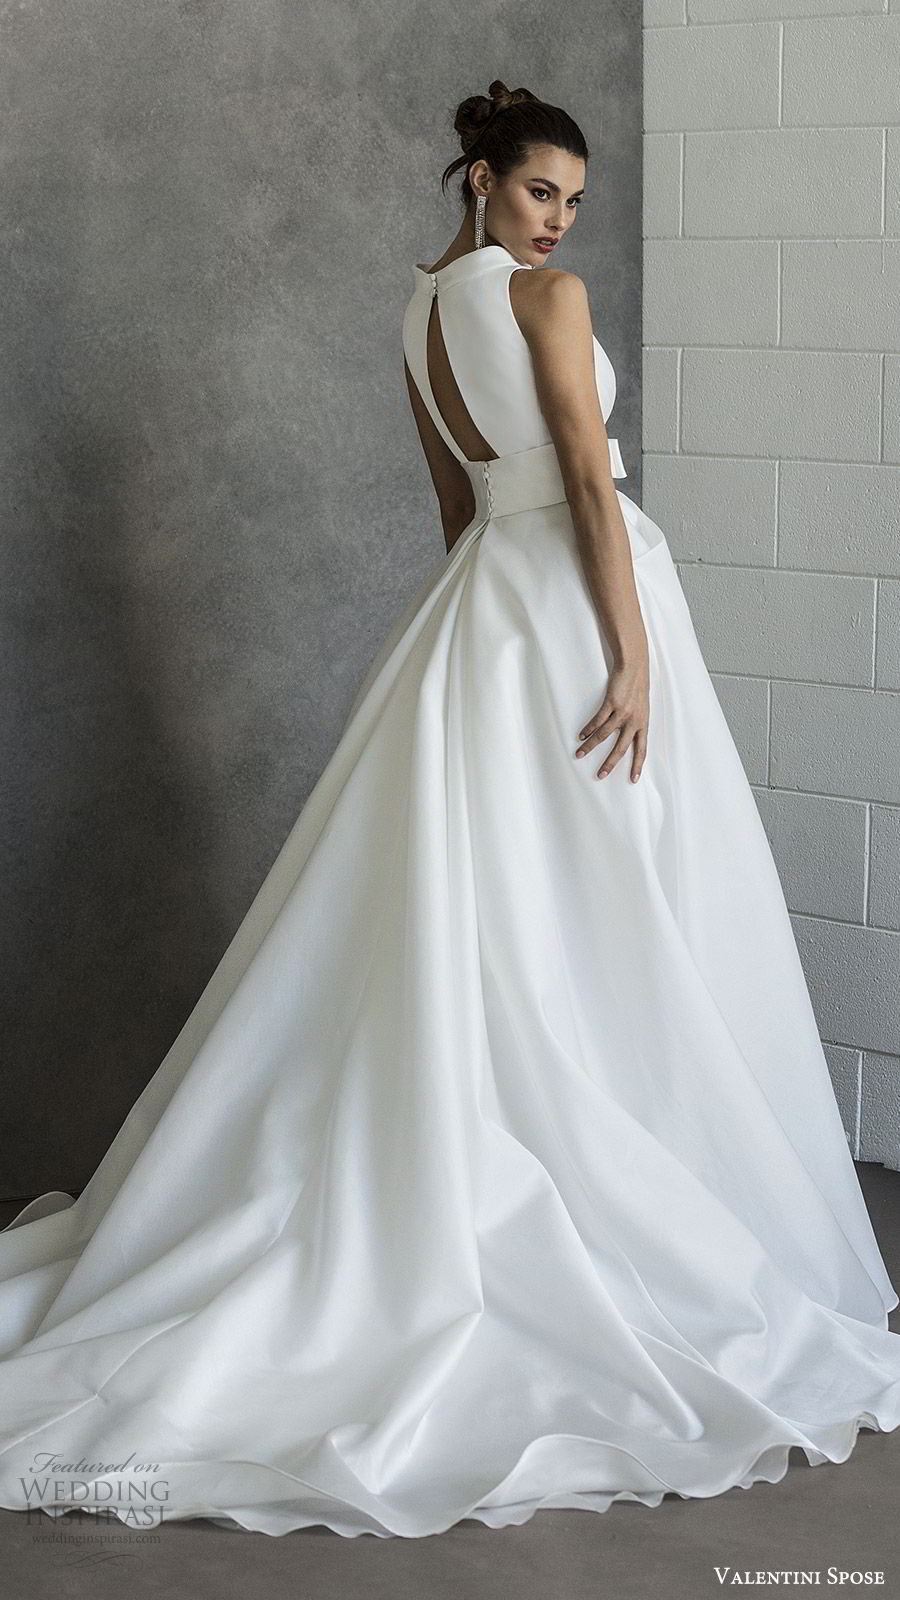 valentini spose spring 2020 bridal sleeveless split funnel neck a line ball gown wedding dress (16) pocket bow waist minimal modern chapel train bv